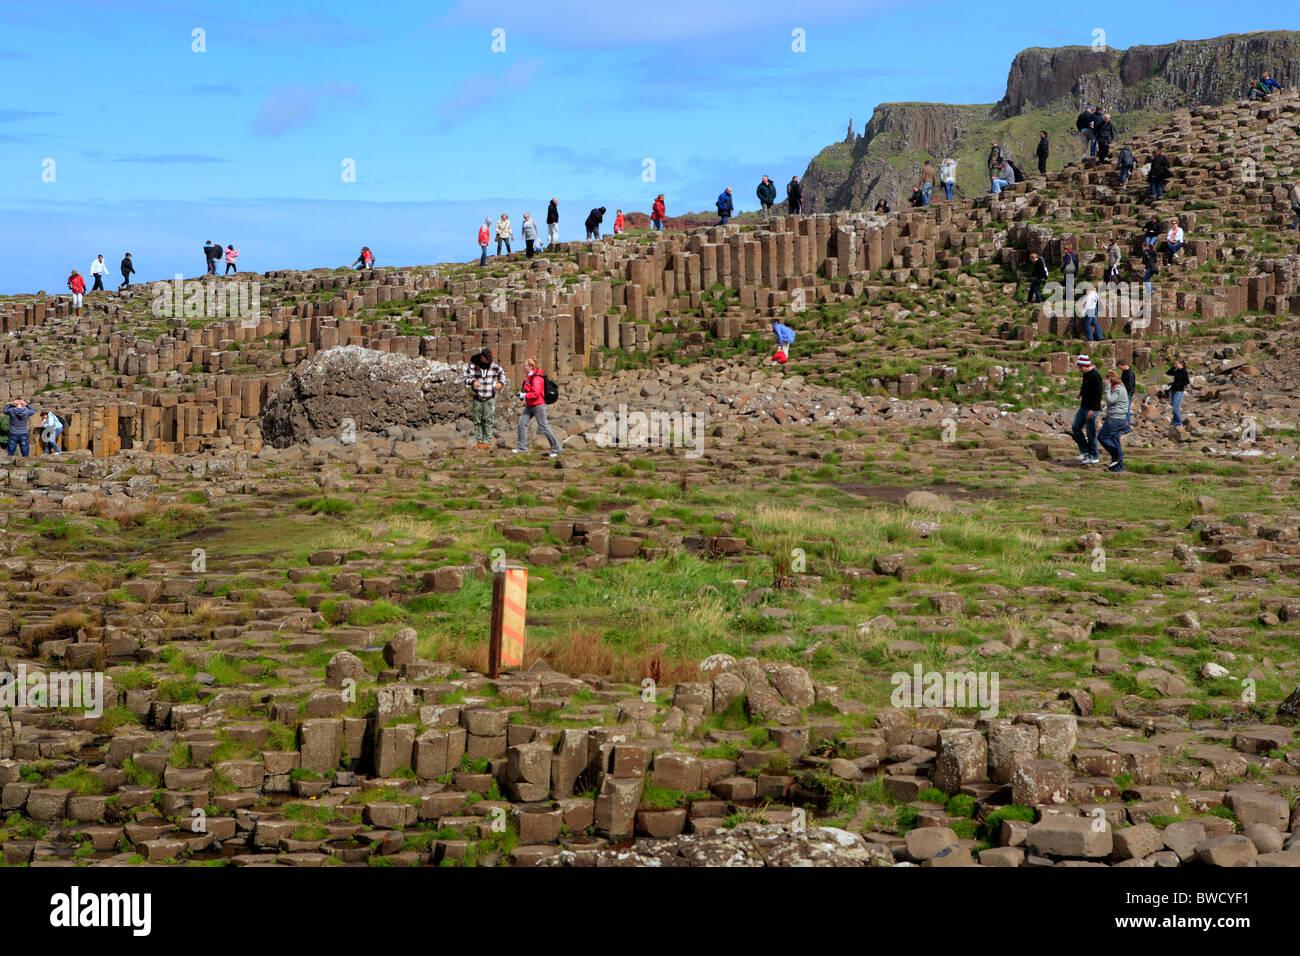 Giant's Causeway, Causeway Coast, Northern Ireland - Stock Image